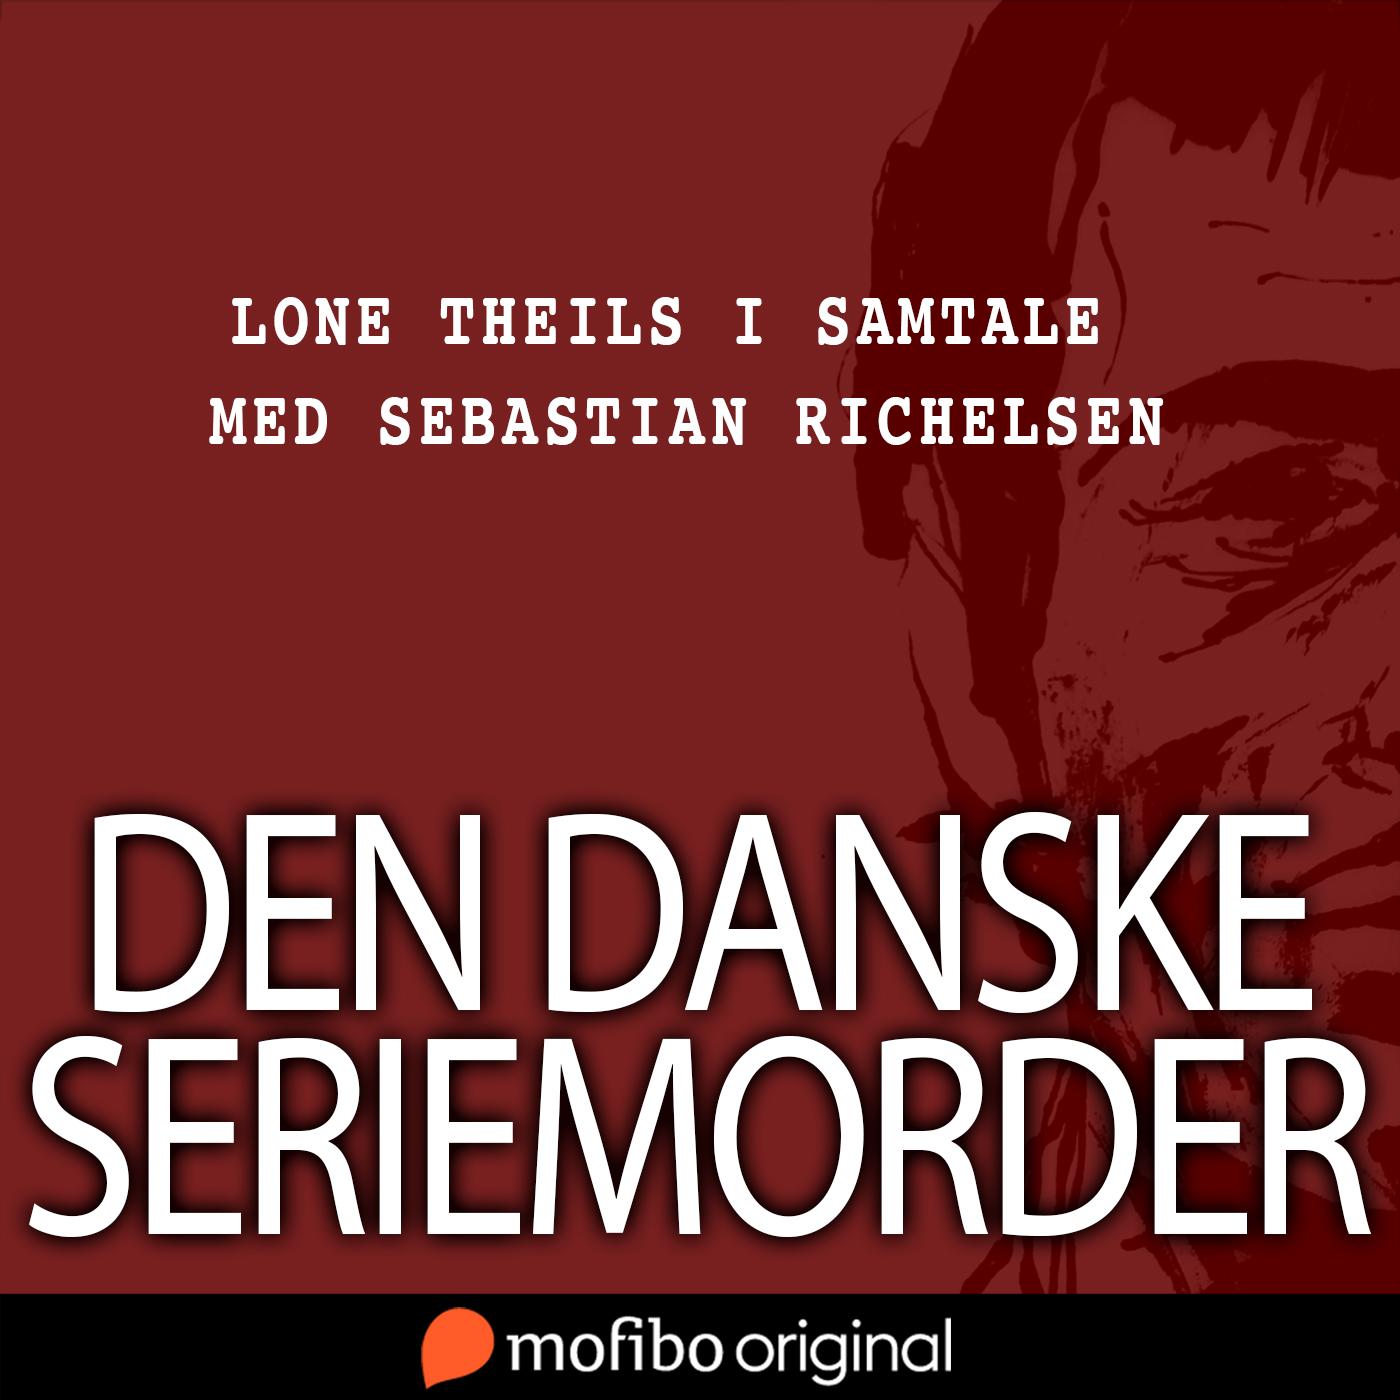 Bag om podcasten 'Den danske seriemorder'